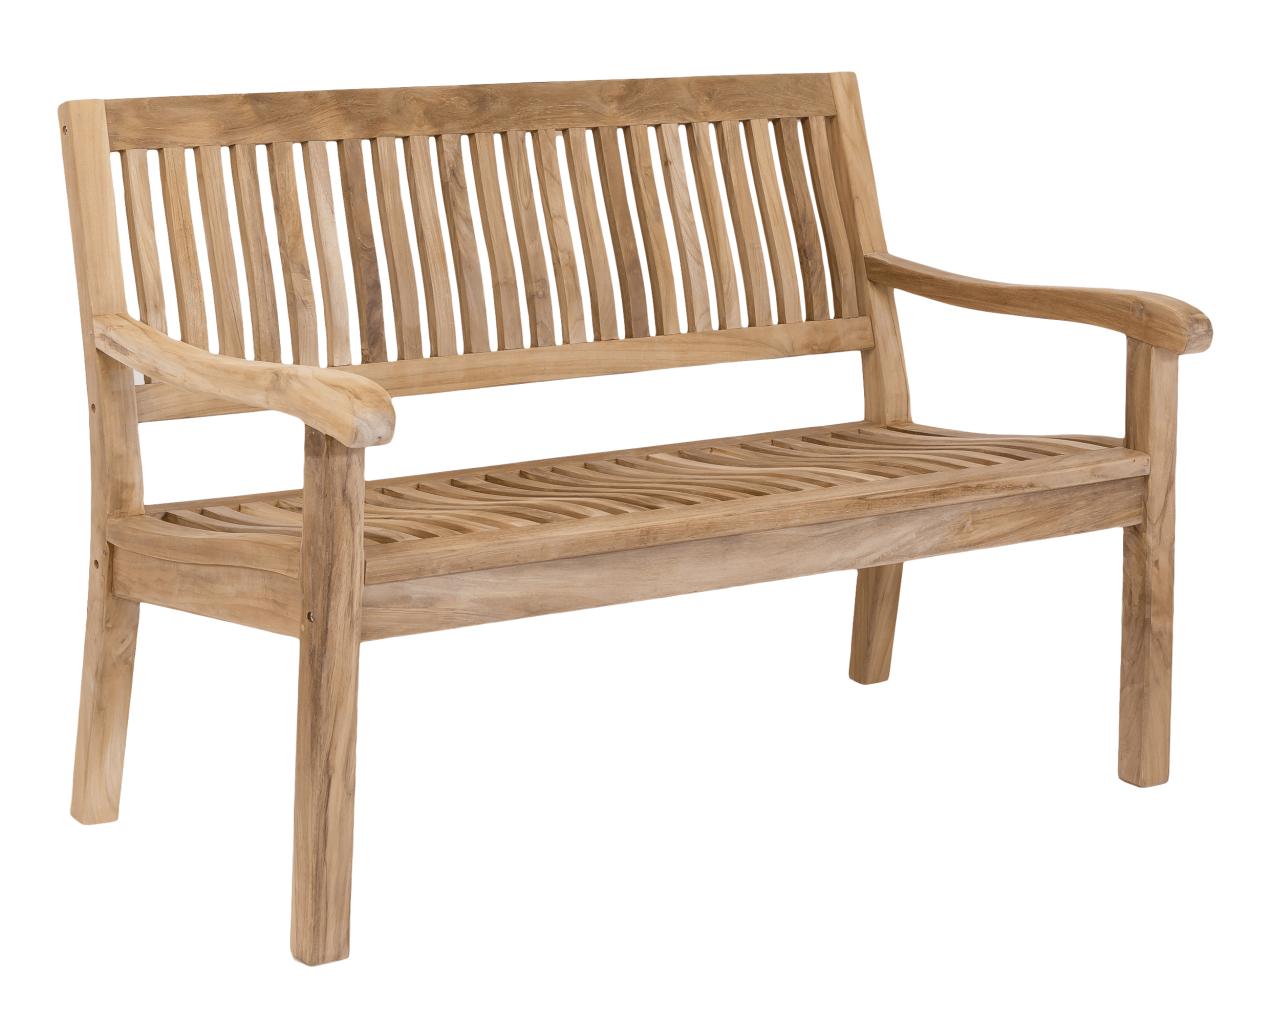 stabile 3 sitzer gartenbank kingsbury in premium teak 150 cm. Black Bedroom Furniture Sets. Home Design Ideas